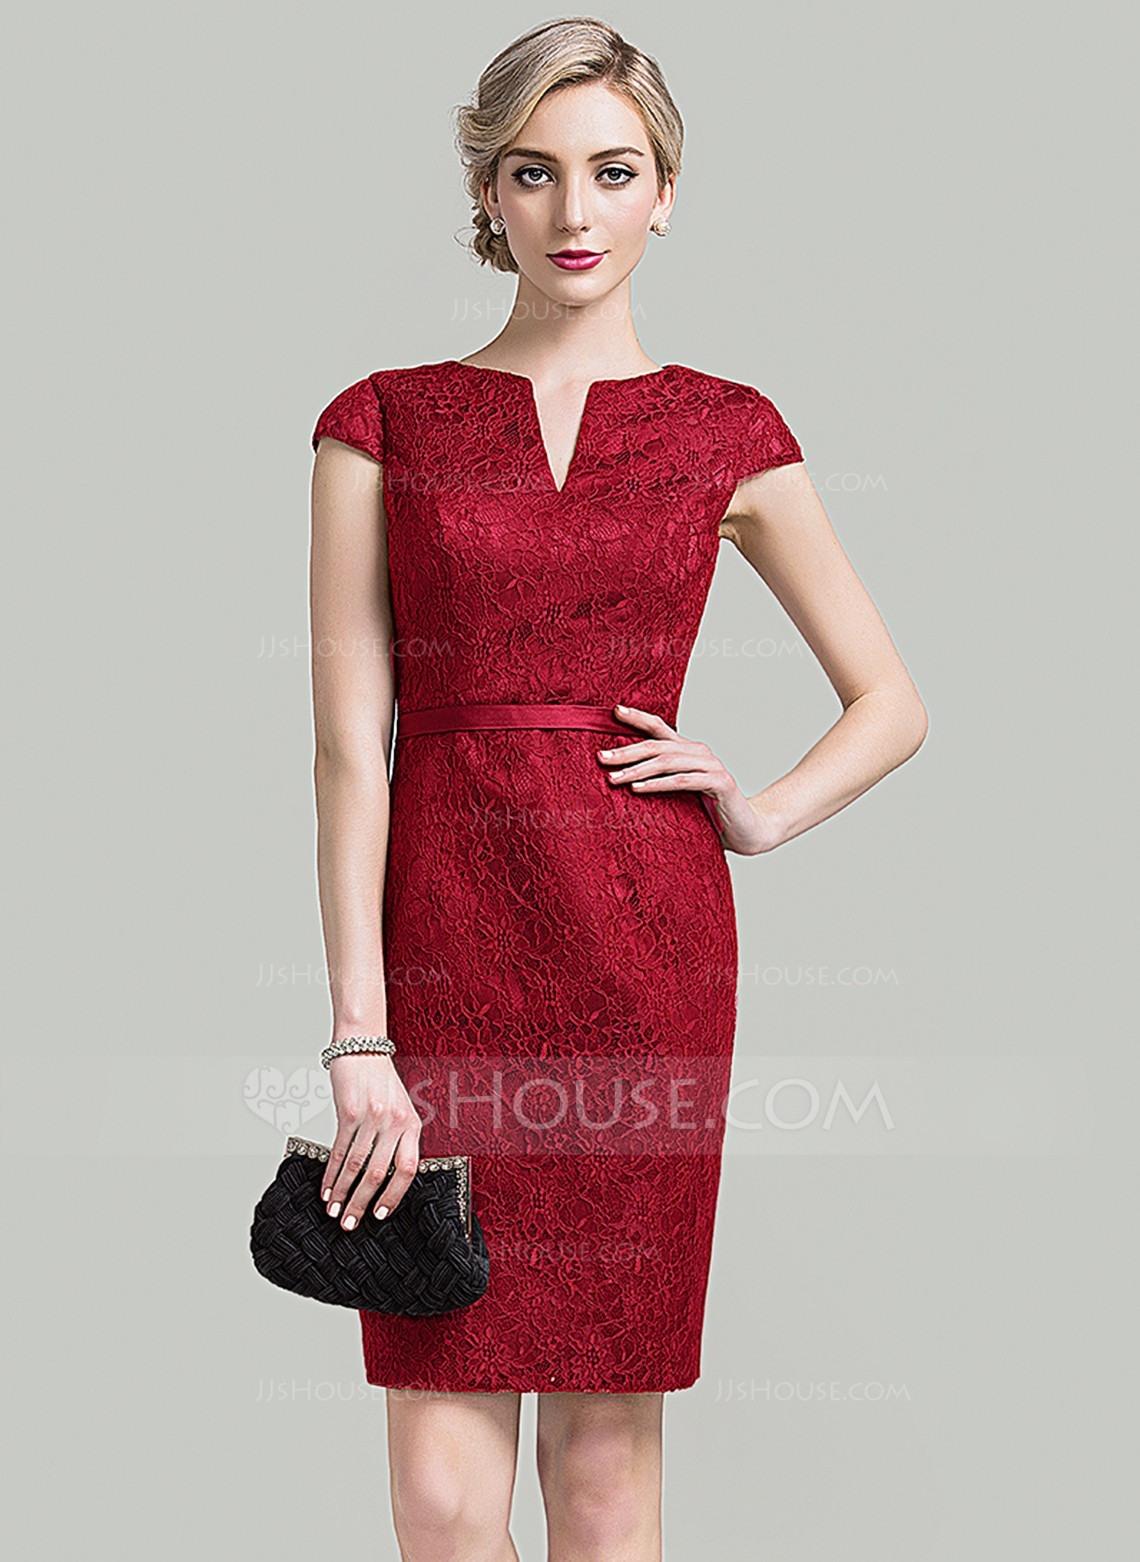 Formal Genial Festliche Kleider A Form Spezialgebiet10 Ausgezeichnet Festliche Kleider A Form Spezialgebiet